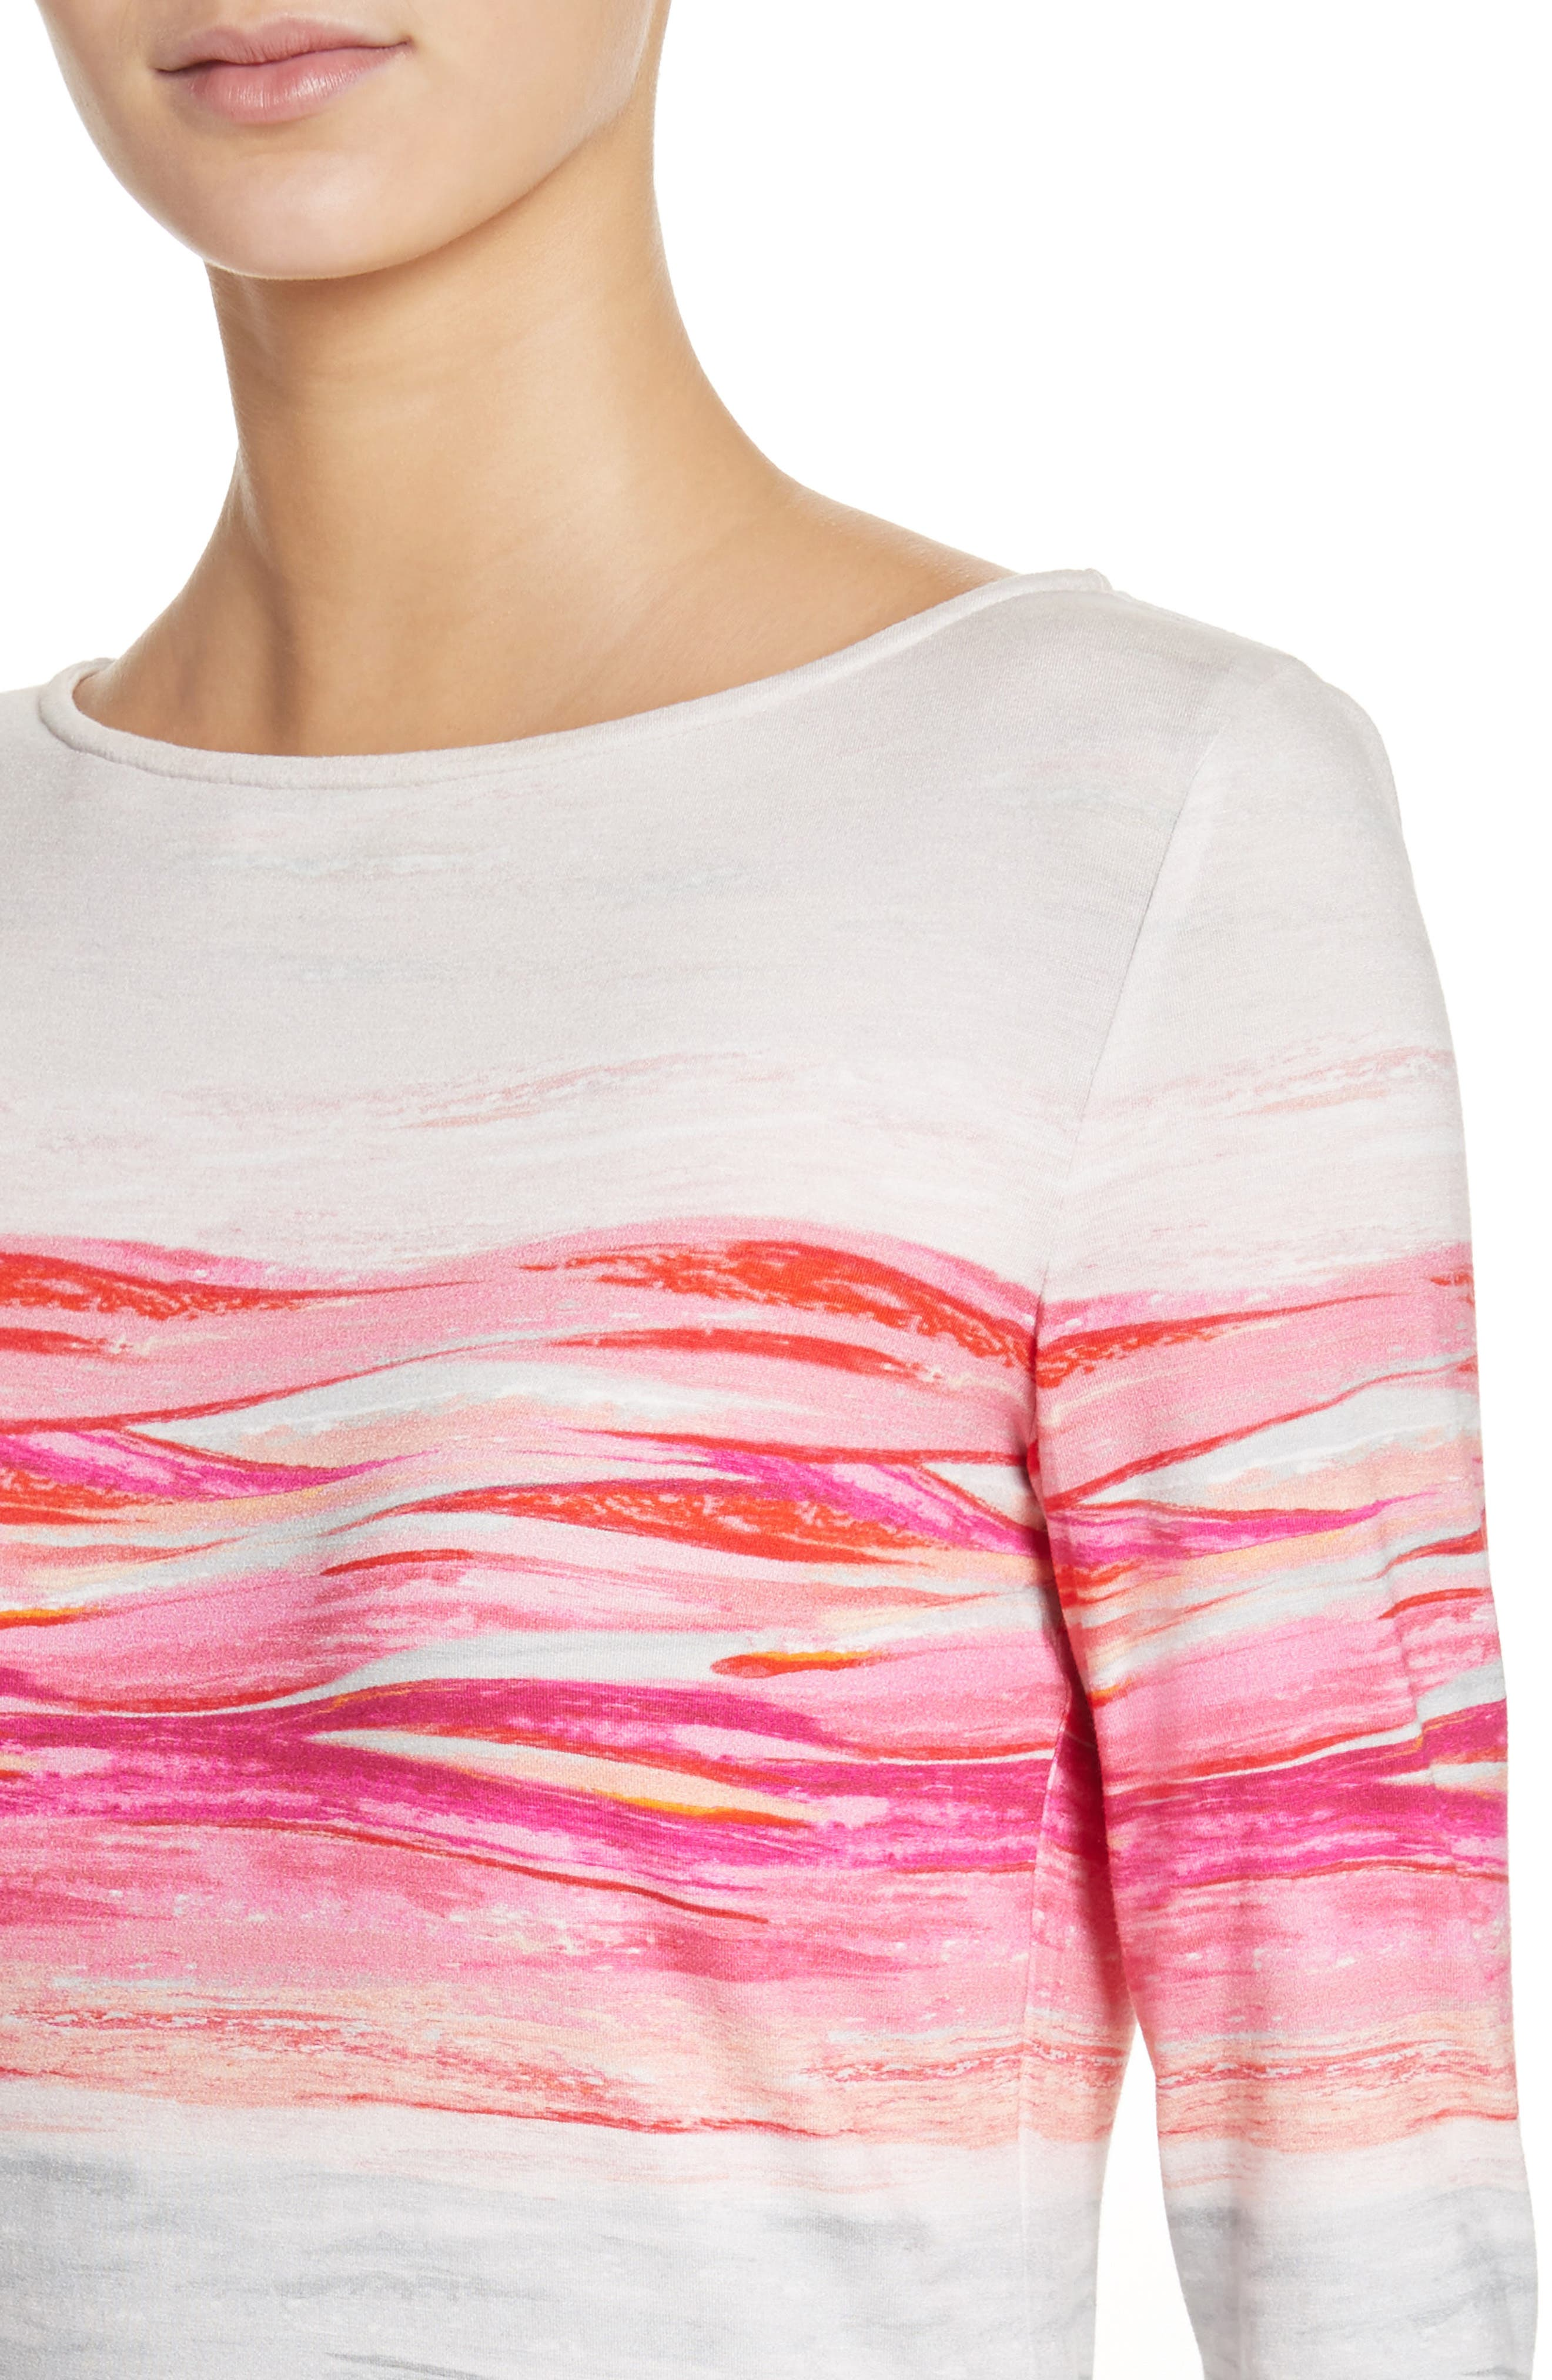 Textured Brushstroke Print Jersey Top,                             Alternate thumbnail 4, color,                             660